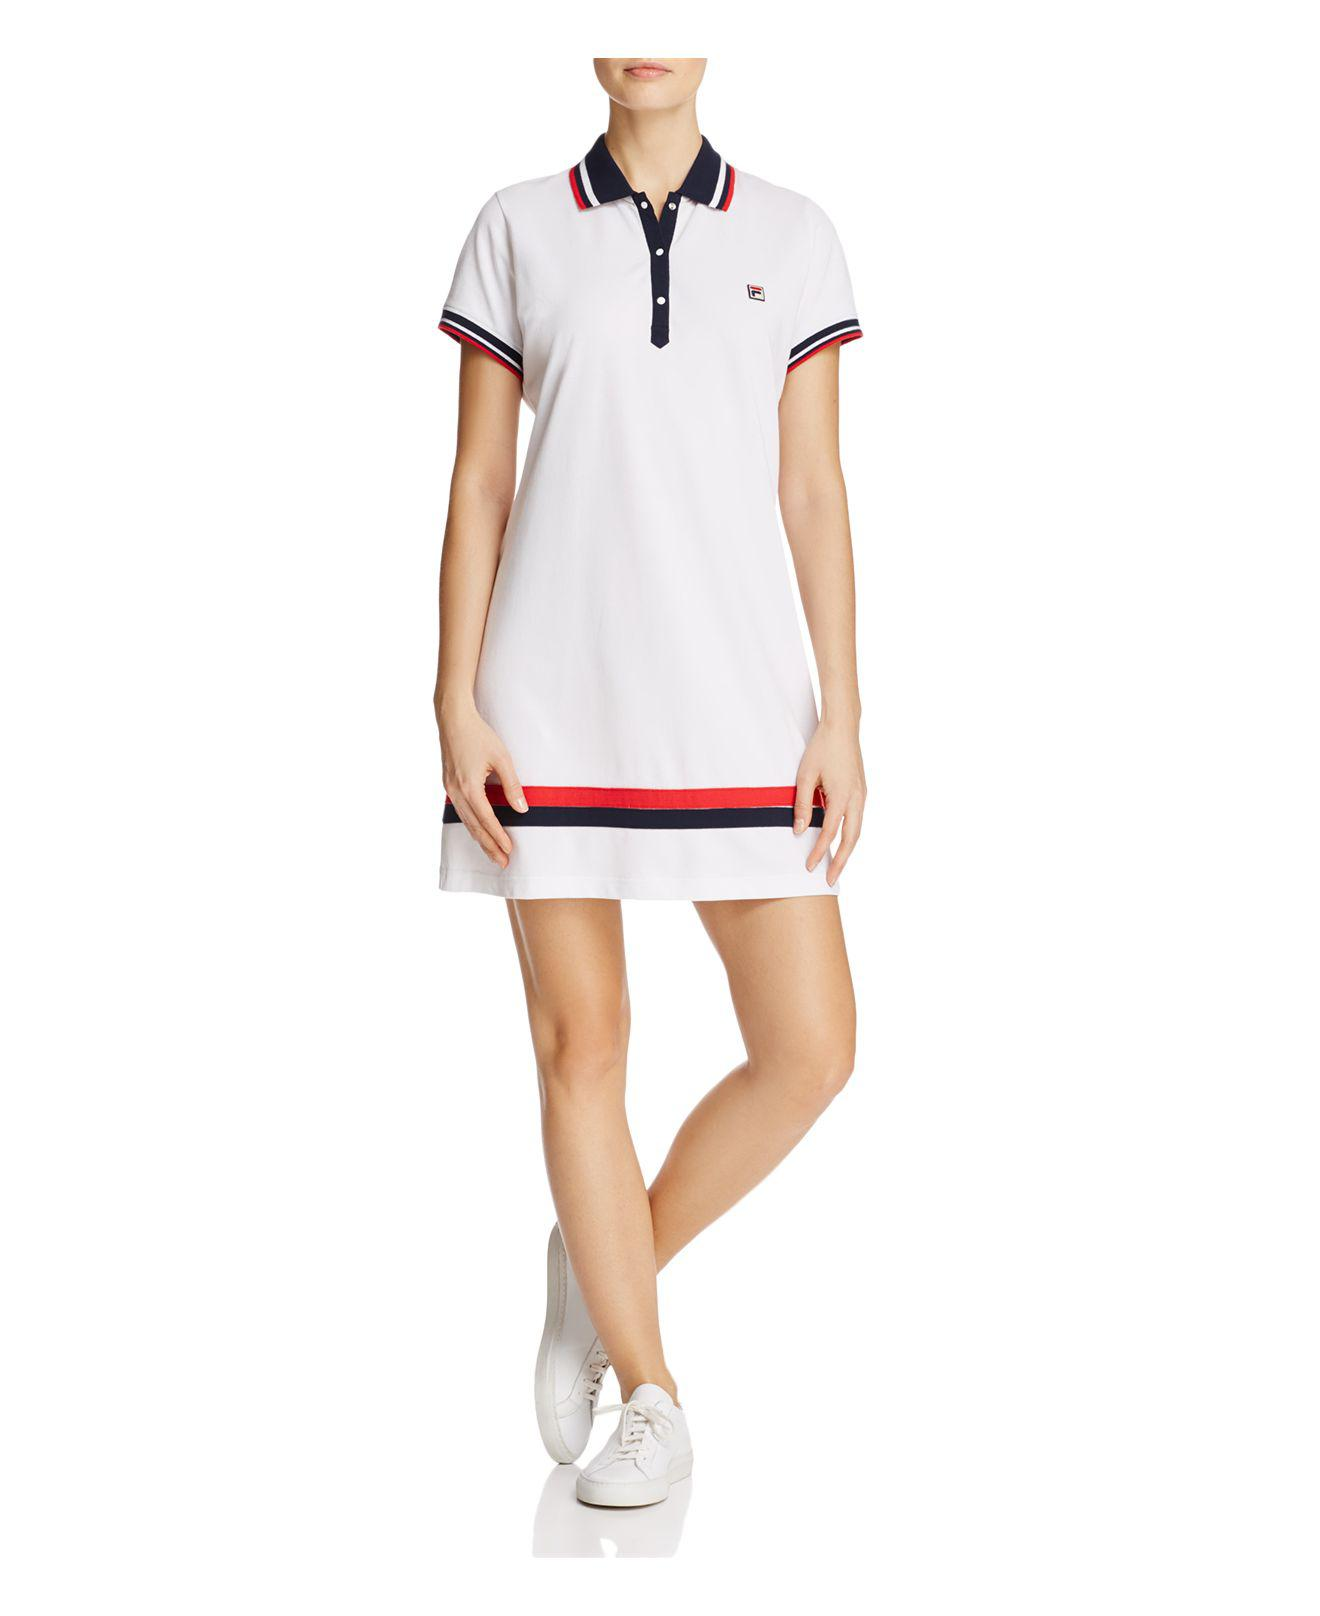 212b9735997f Fila Jennifer Cotton Polo Tennis Dress in White - Lyst